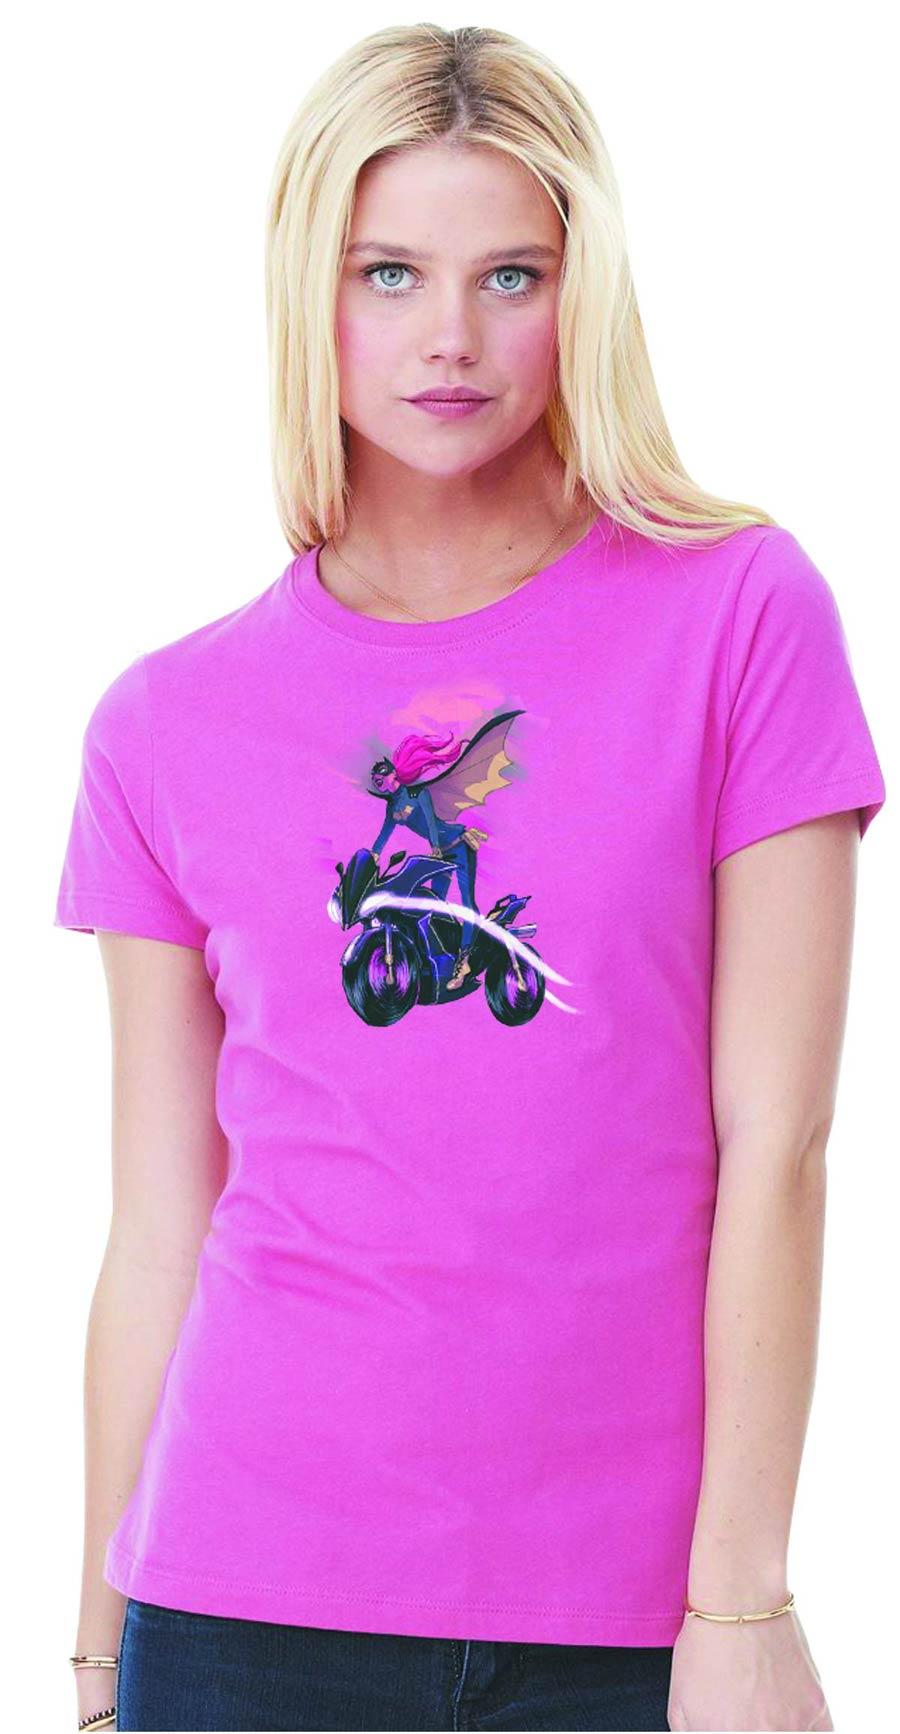 Batgirl Soar By Babs Tarr Womens T-Shirt Large